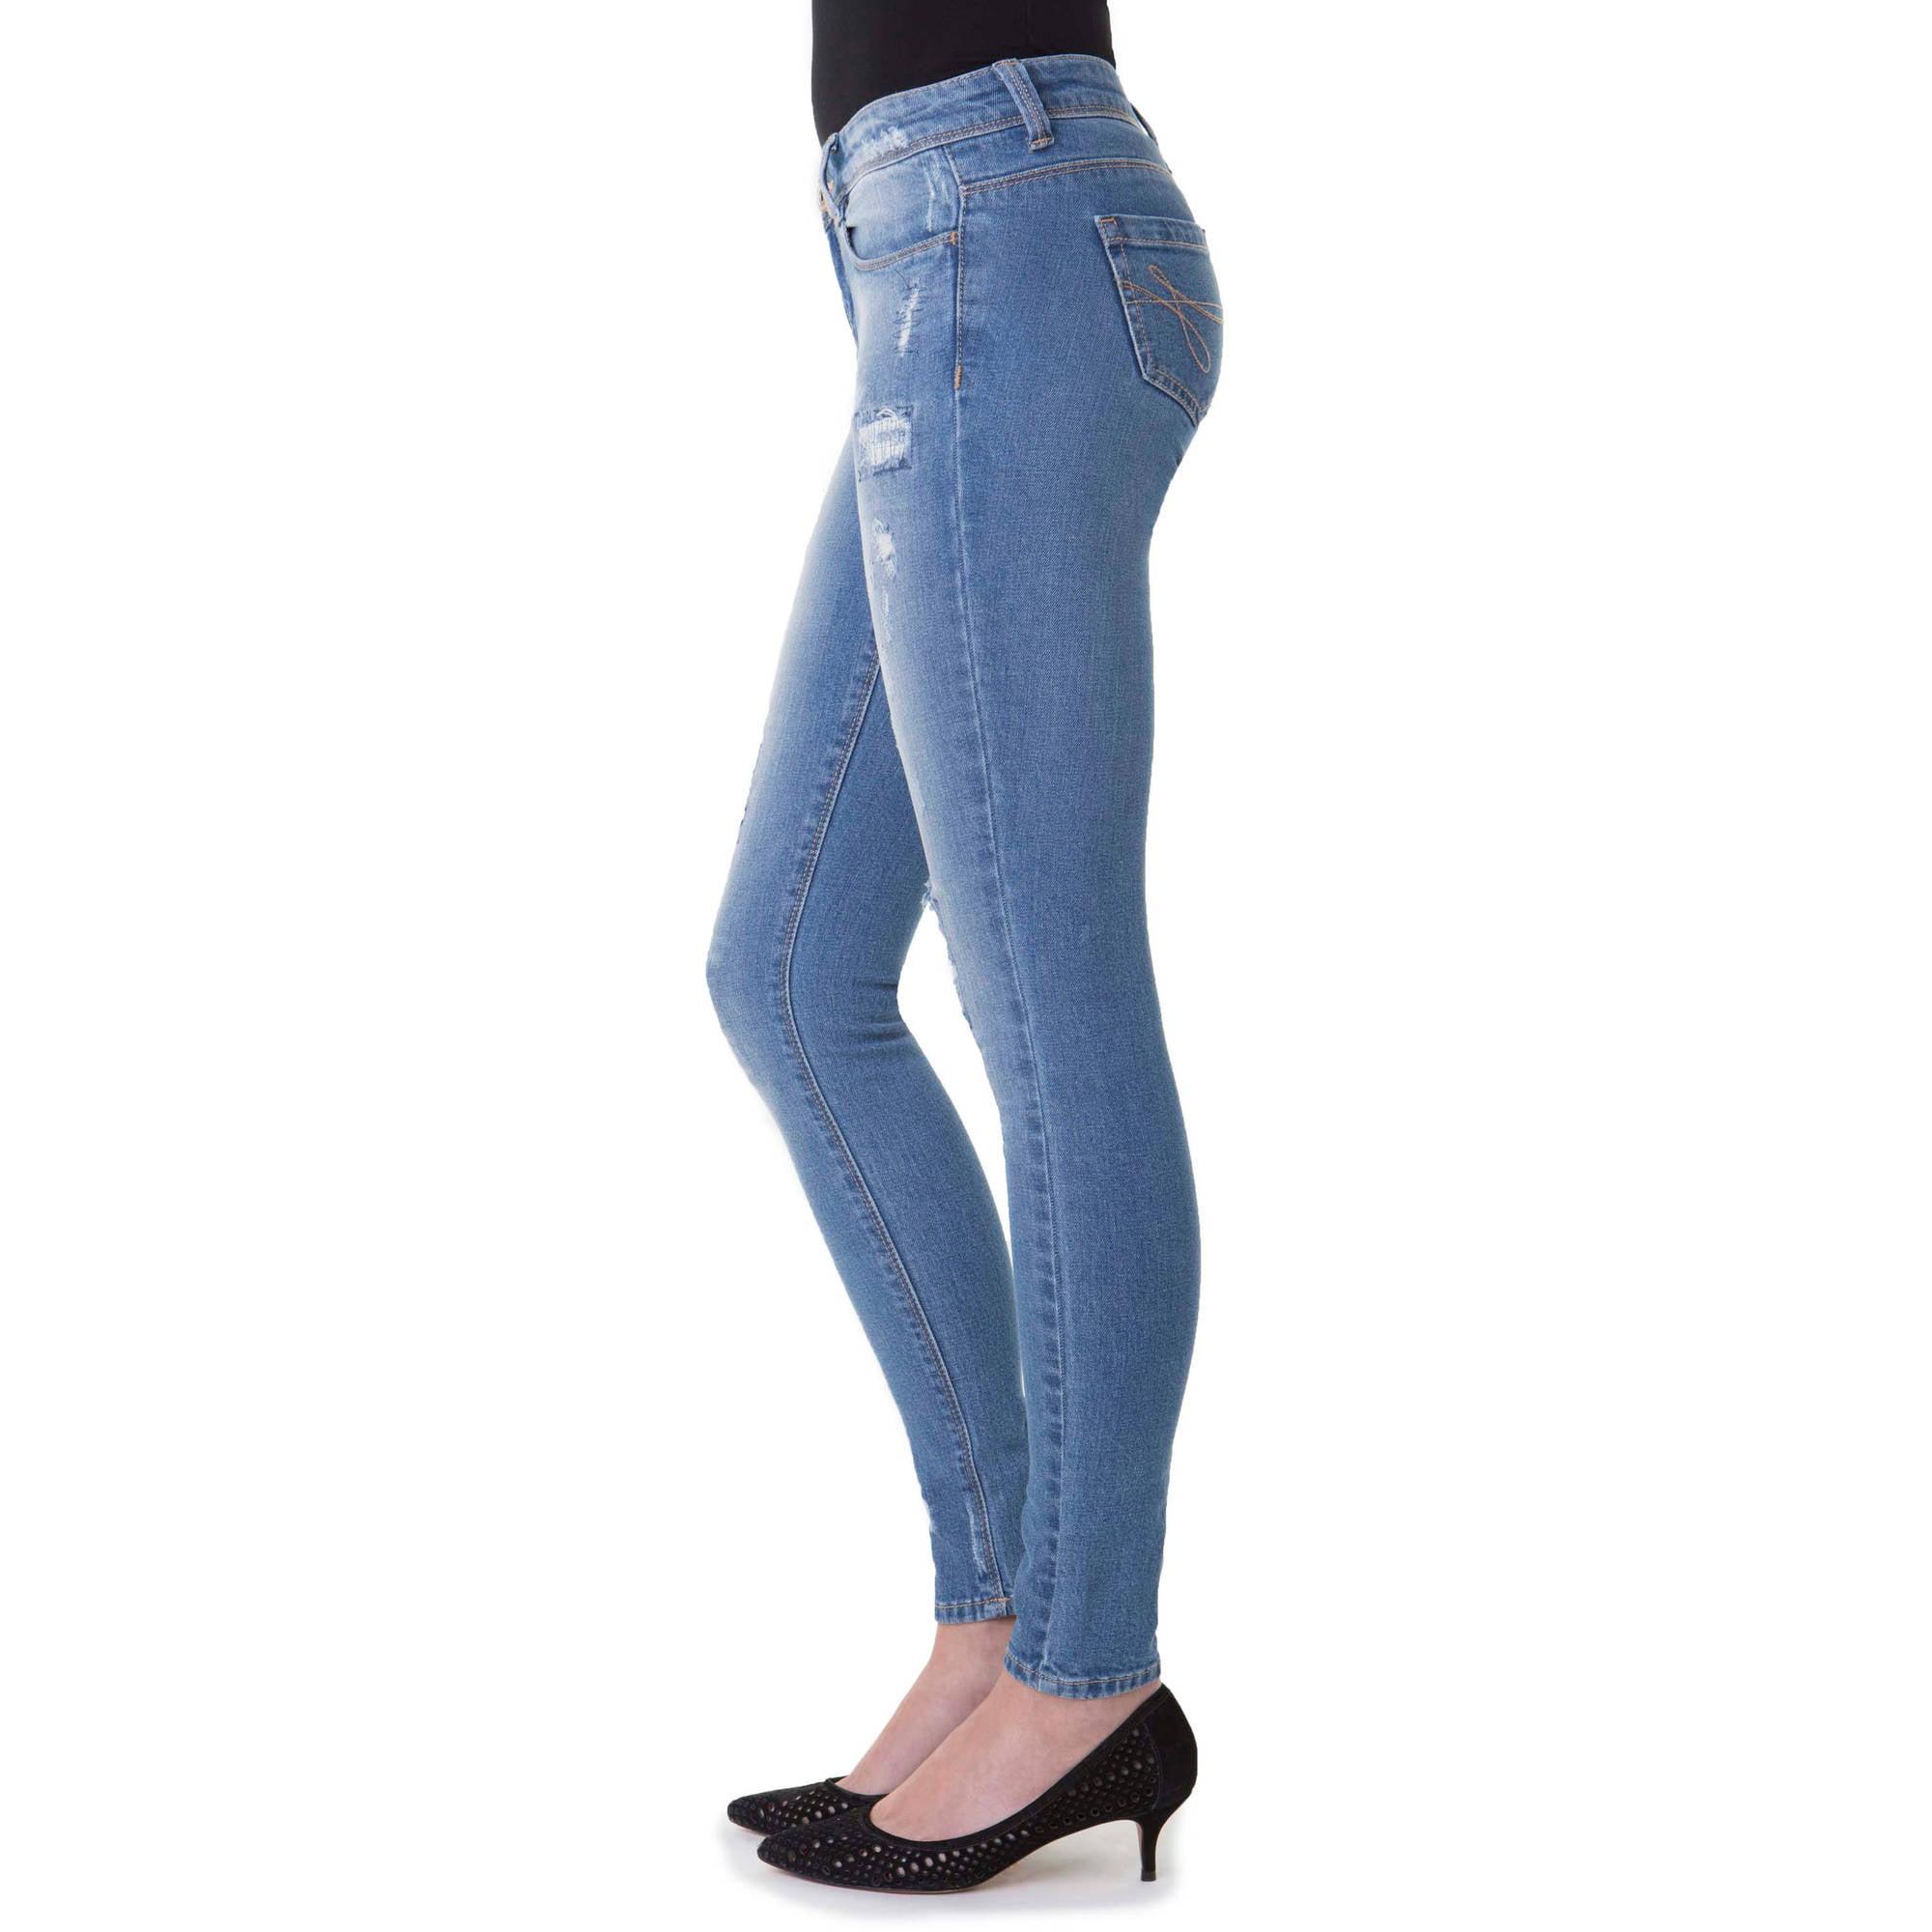 b56952398d6 J Jeans by Jordache - J Jeans By Jordache Distressed Skinny Je - Walmart.com